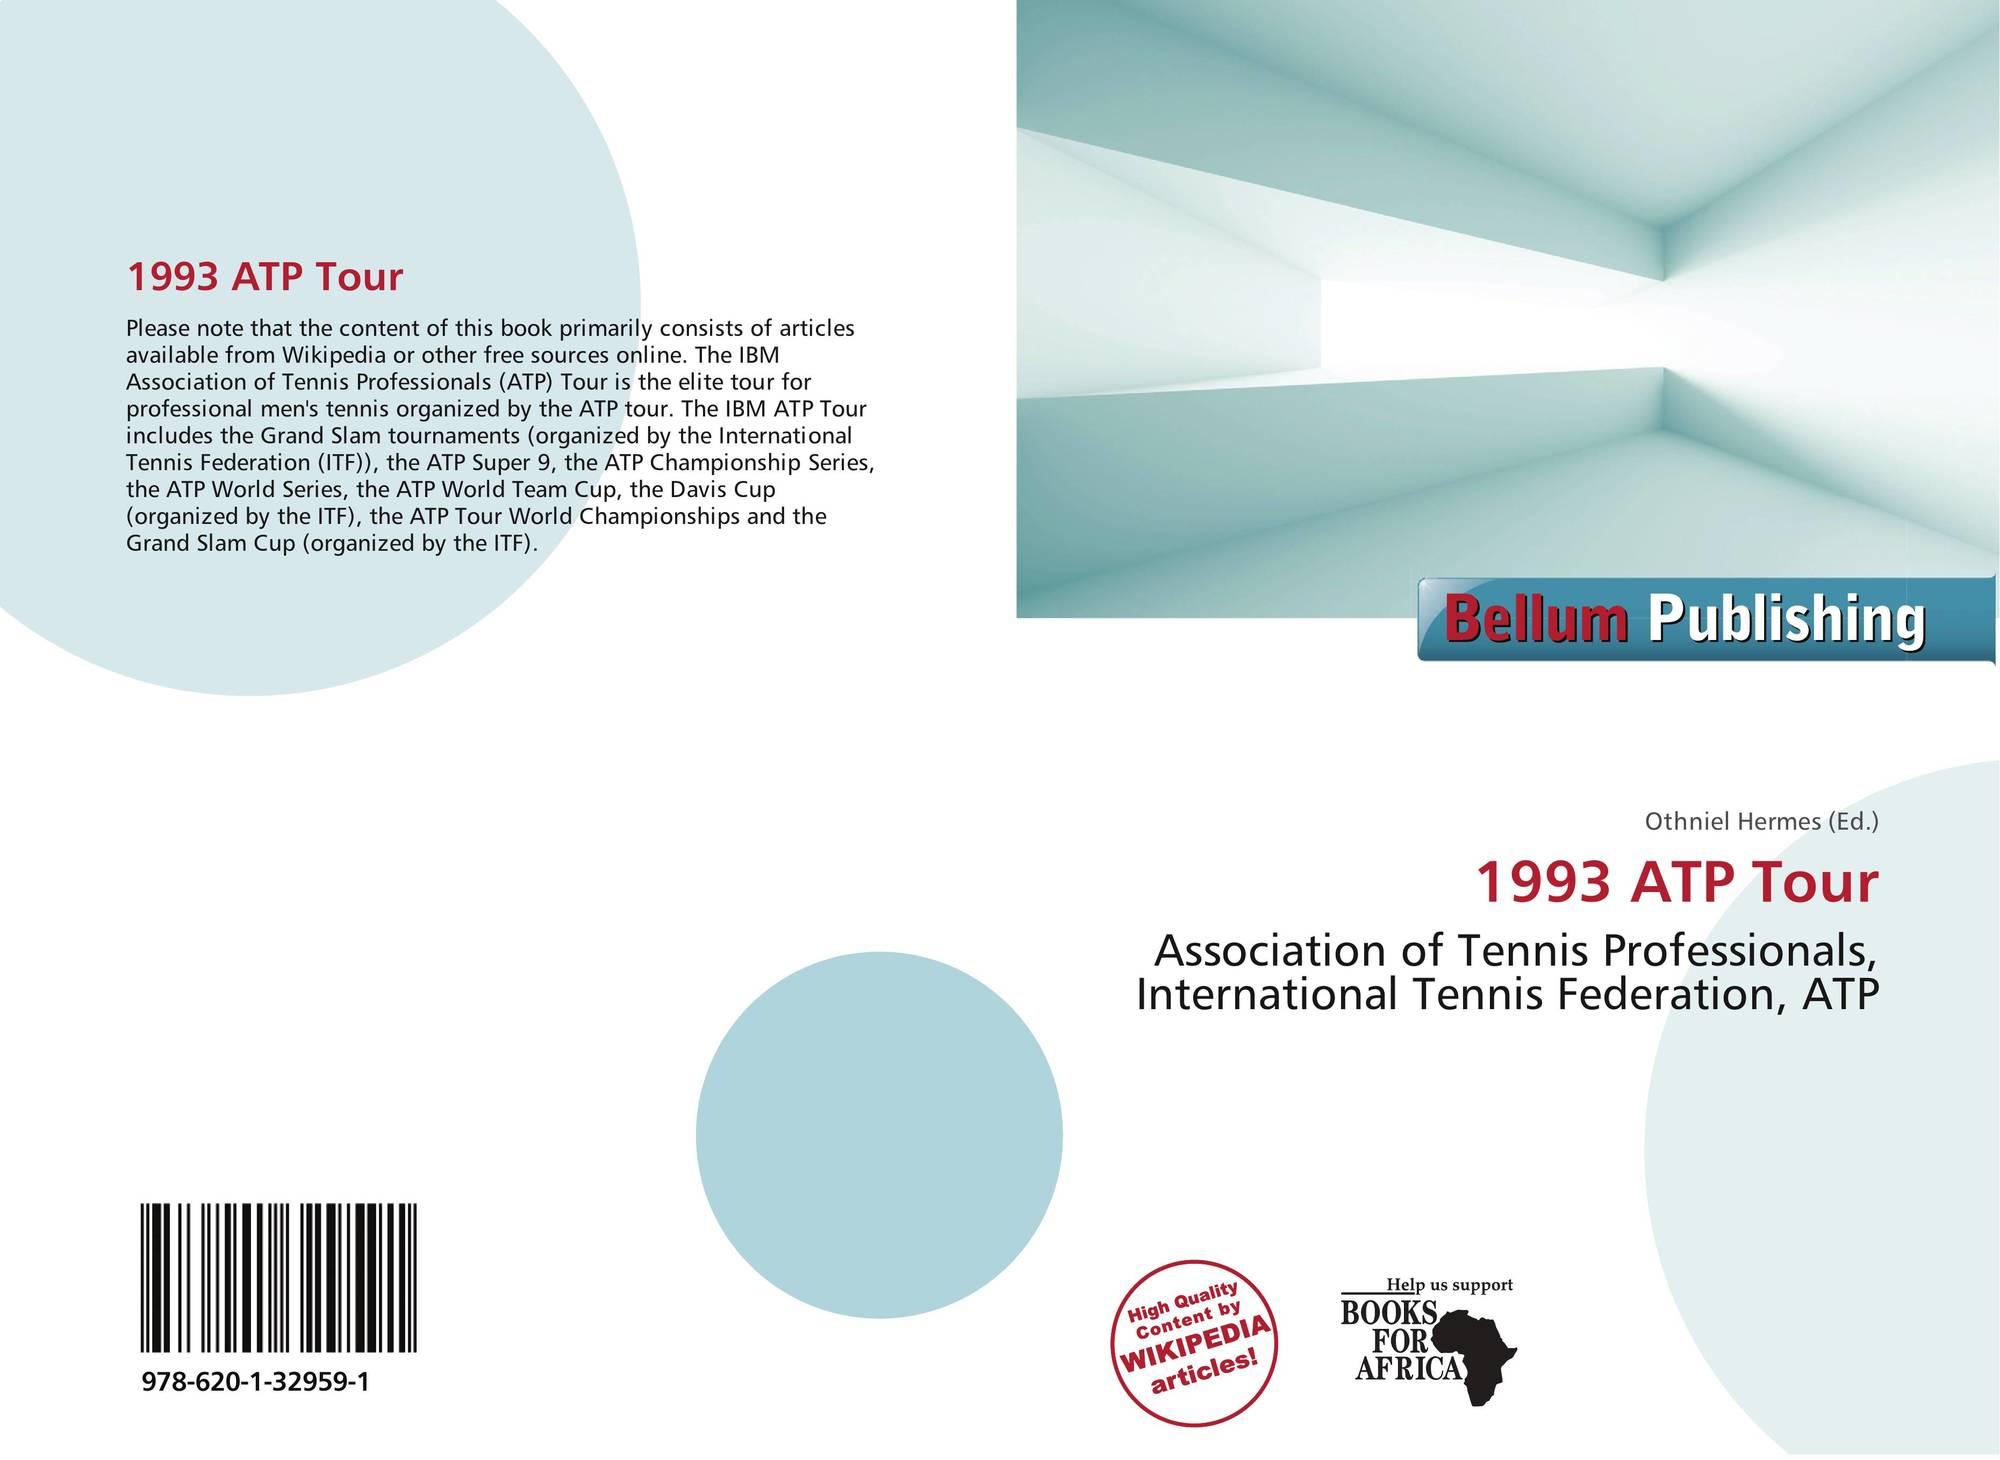 1993 ATP Tour #